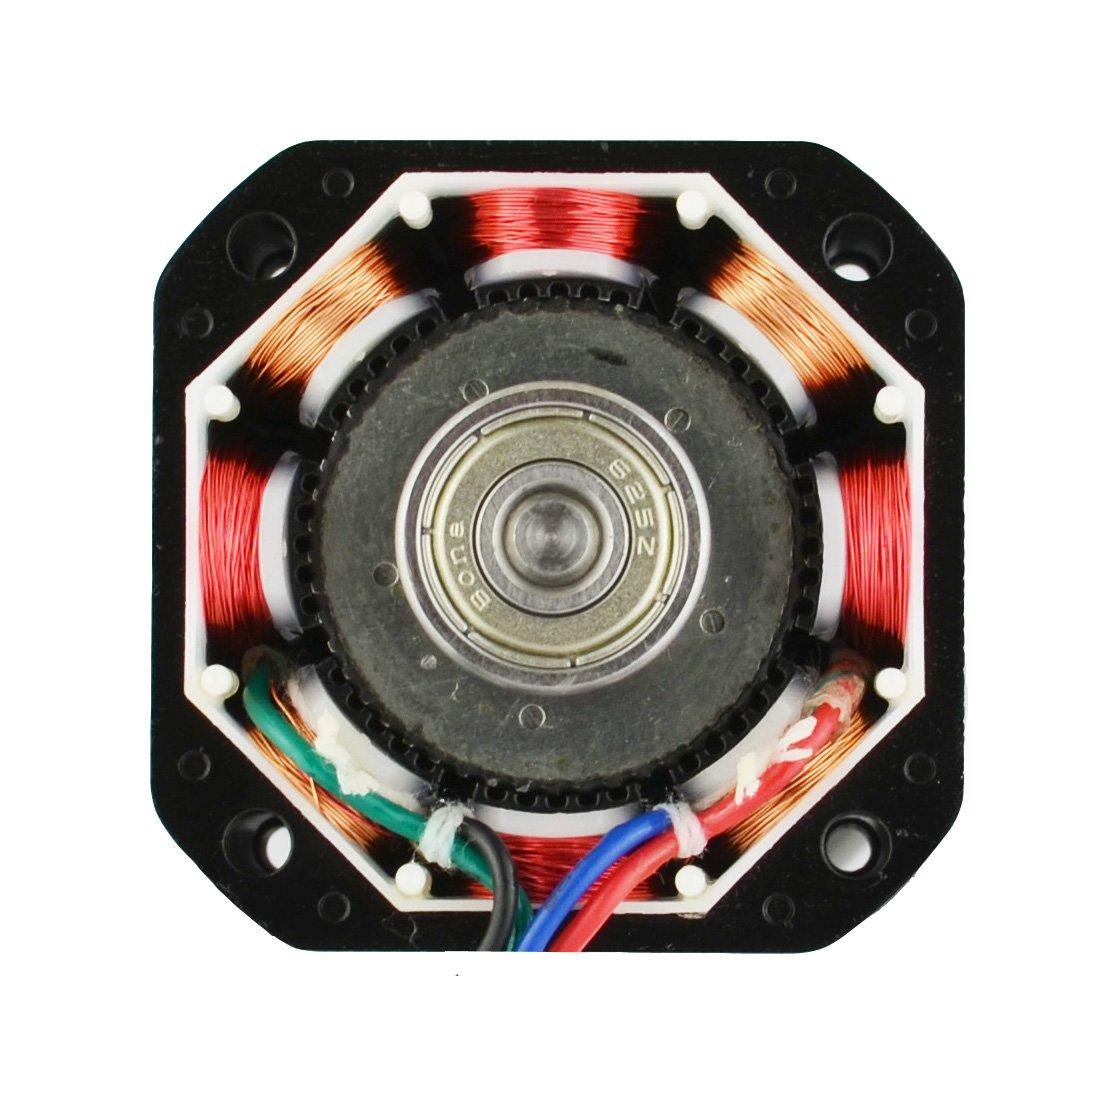 Stepper Motor Nema 17 Bipolar 40mm 64ozin45ncm 2a 4 Wiring Reprap Prusa Mendel Build Manual Nextday Lead 3d Printer Hobby Cnc Camera Photo